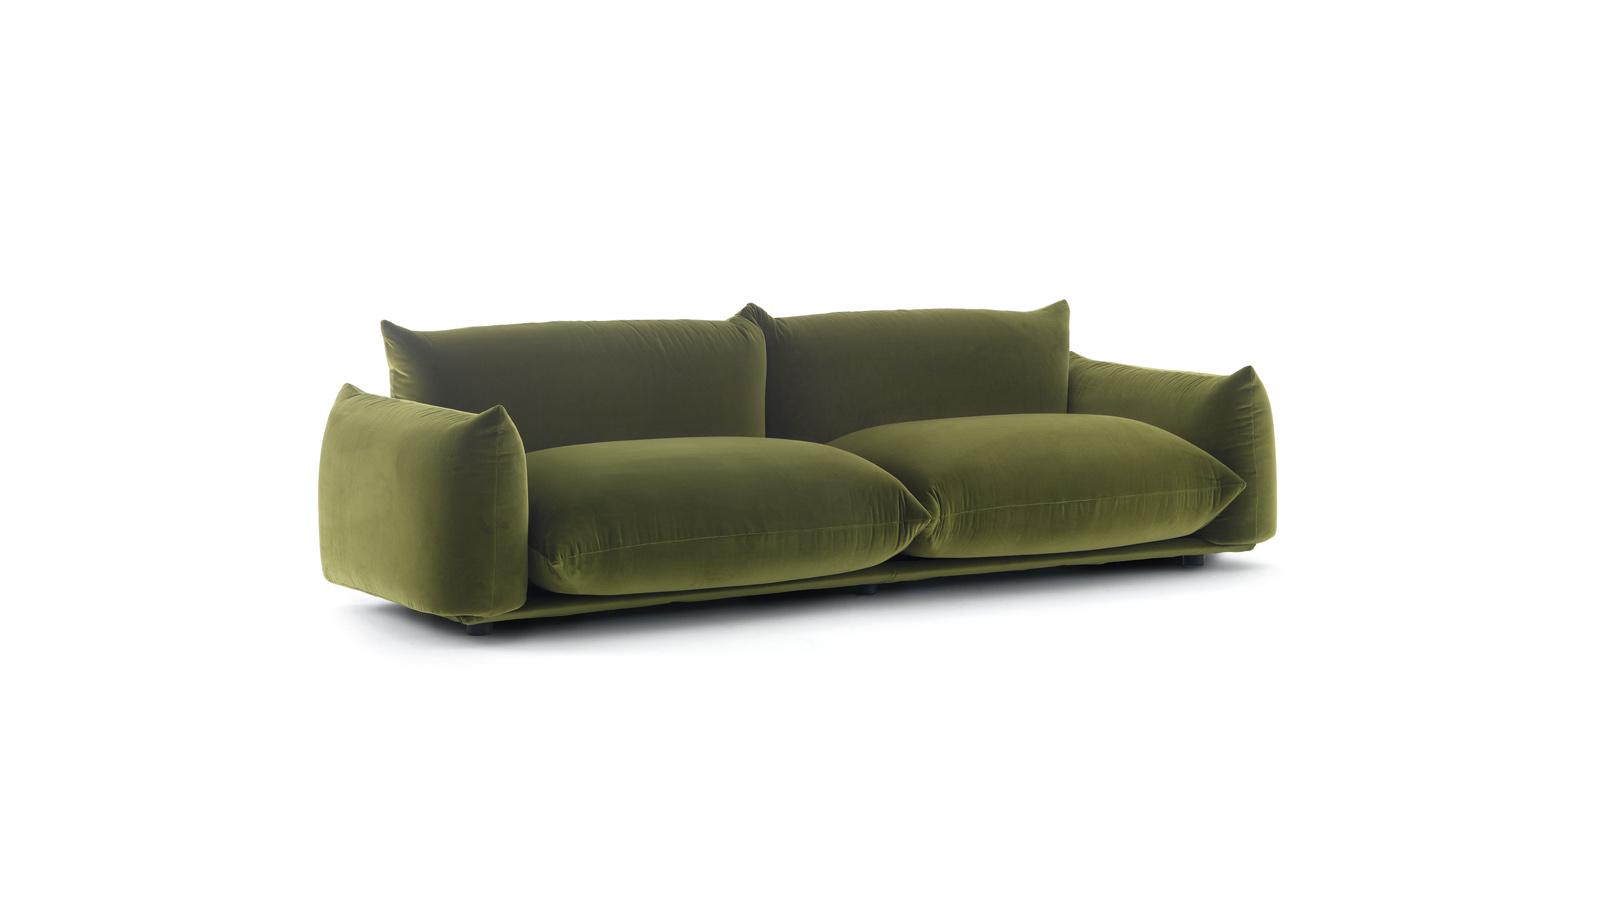 TinnappelMetz-arflex-marenco-sofa-10